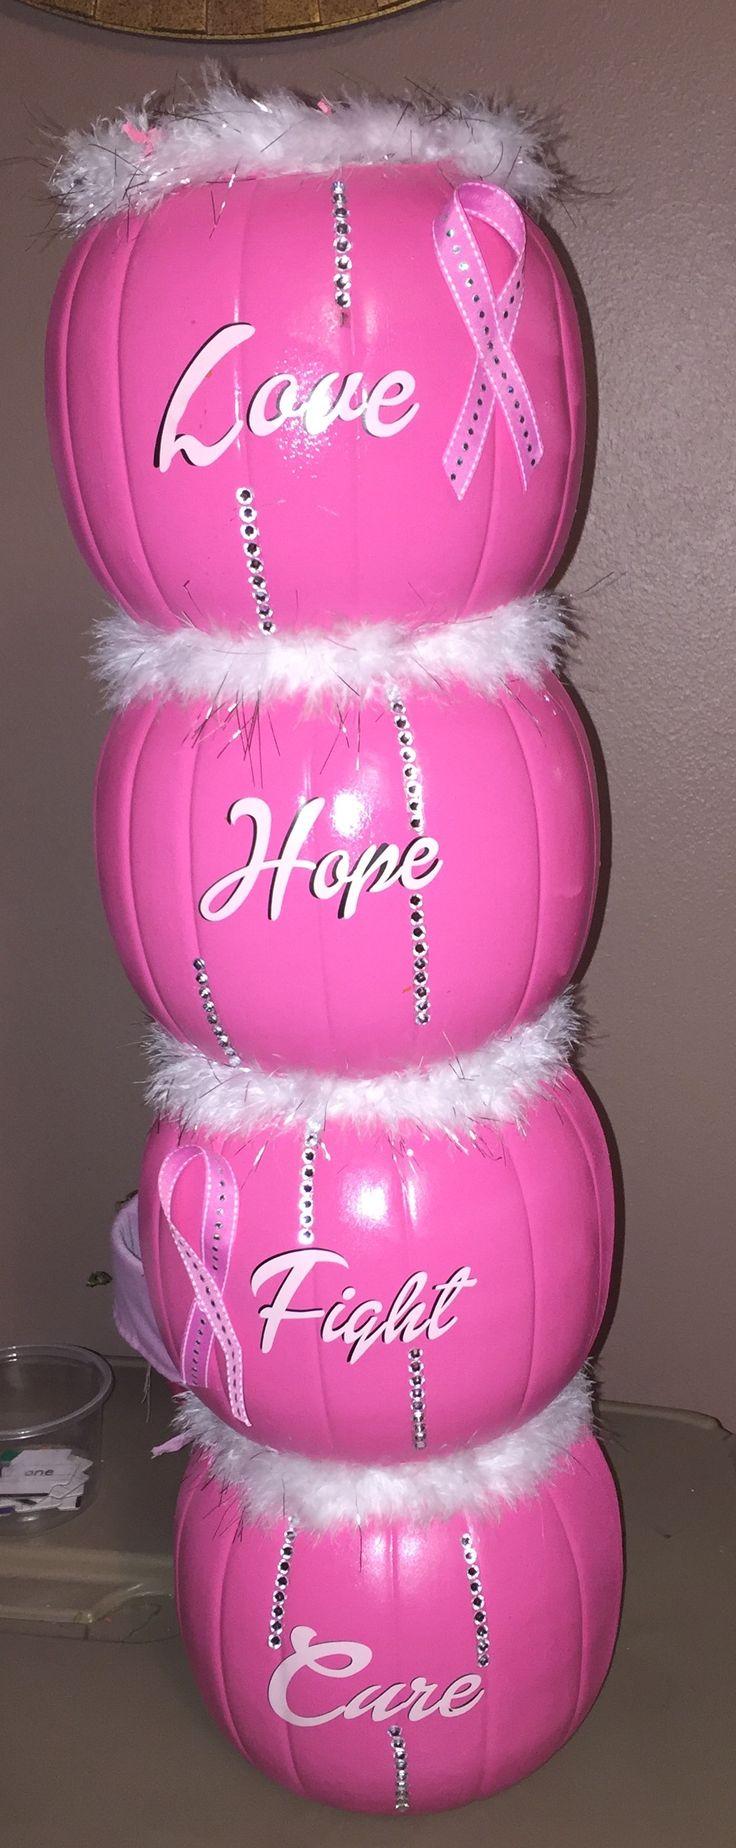 97 Best Breast Cancer Awareness Images On Pinterest